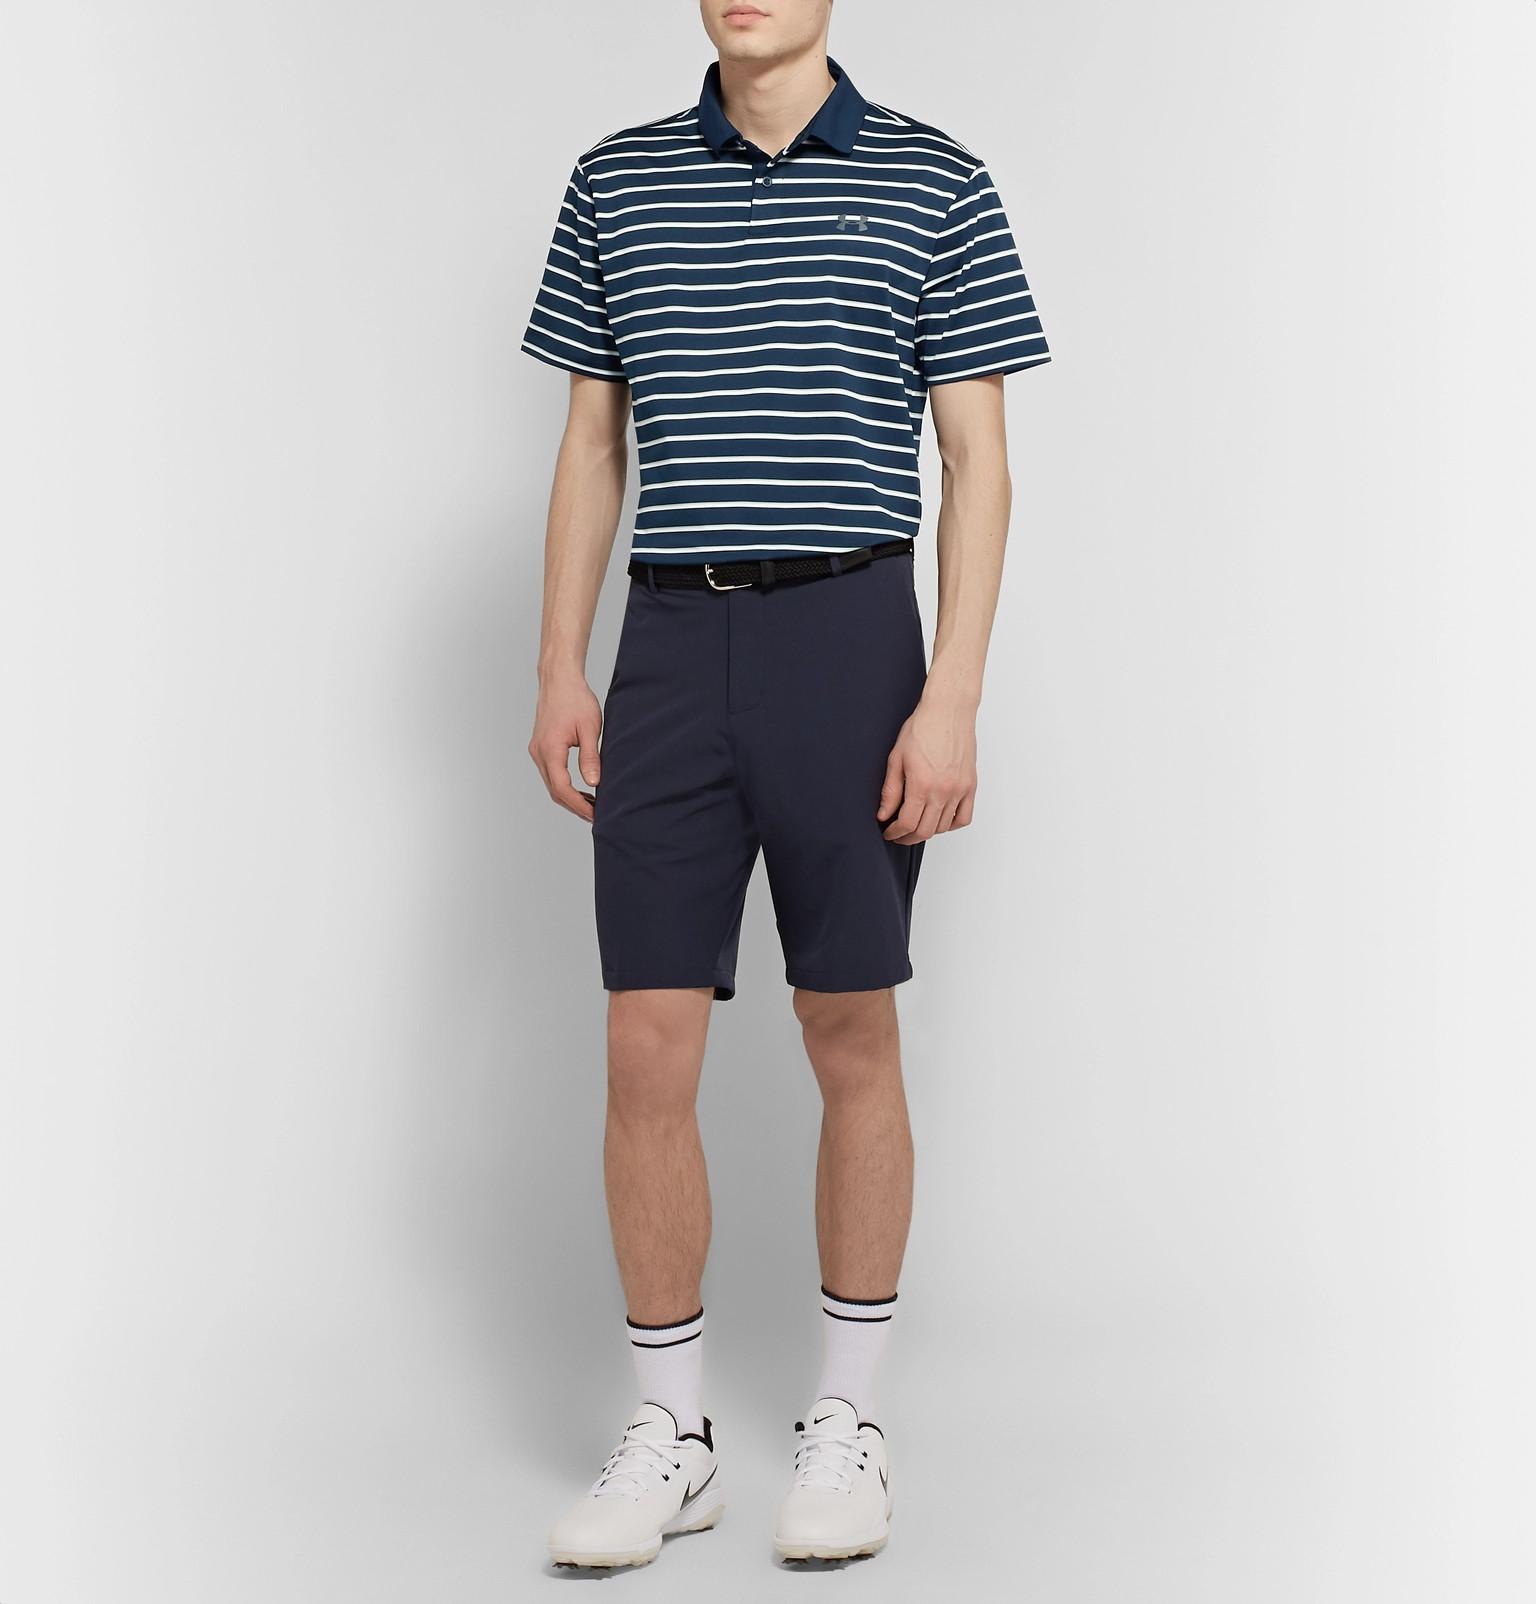 68c9b69a9a Under Armour - Performance Striped HeatGear Golf Polo Shirt